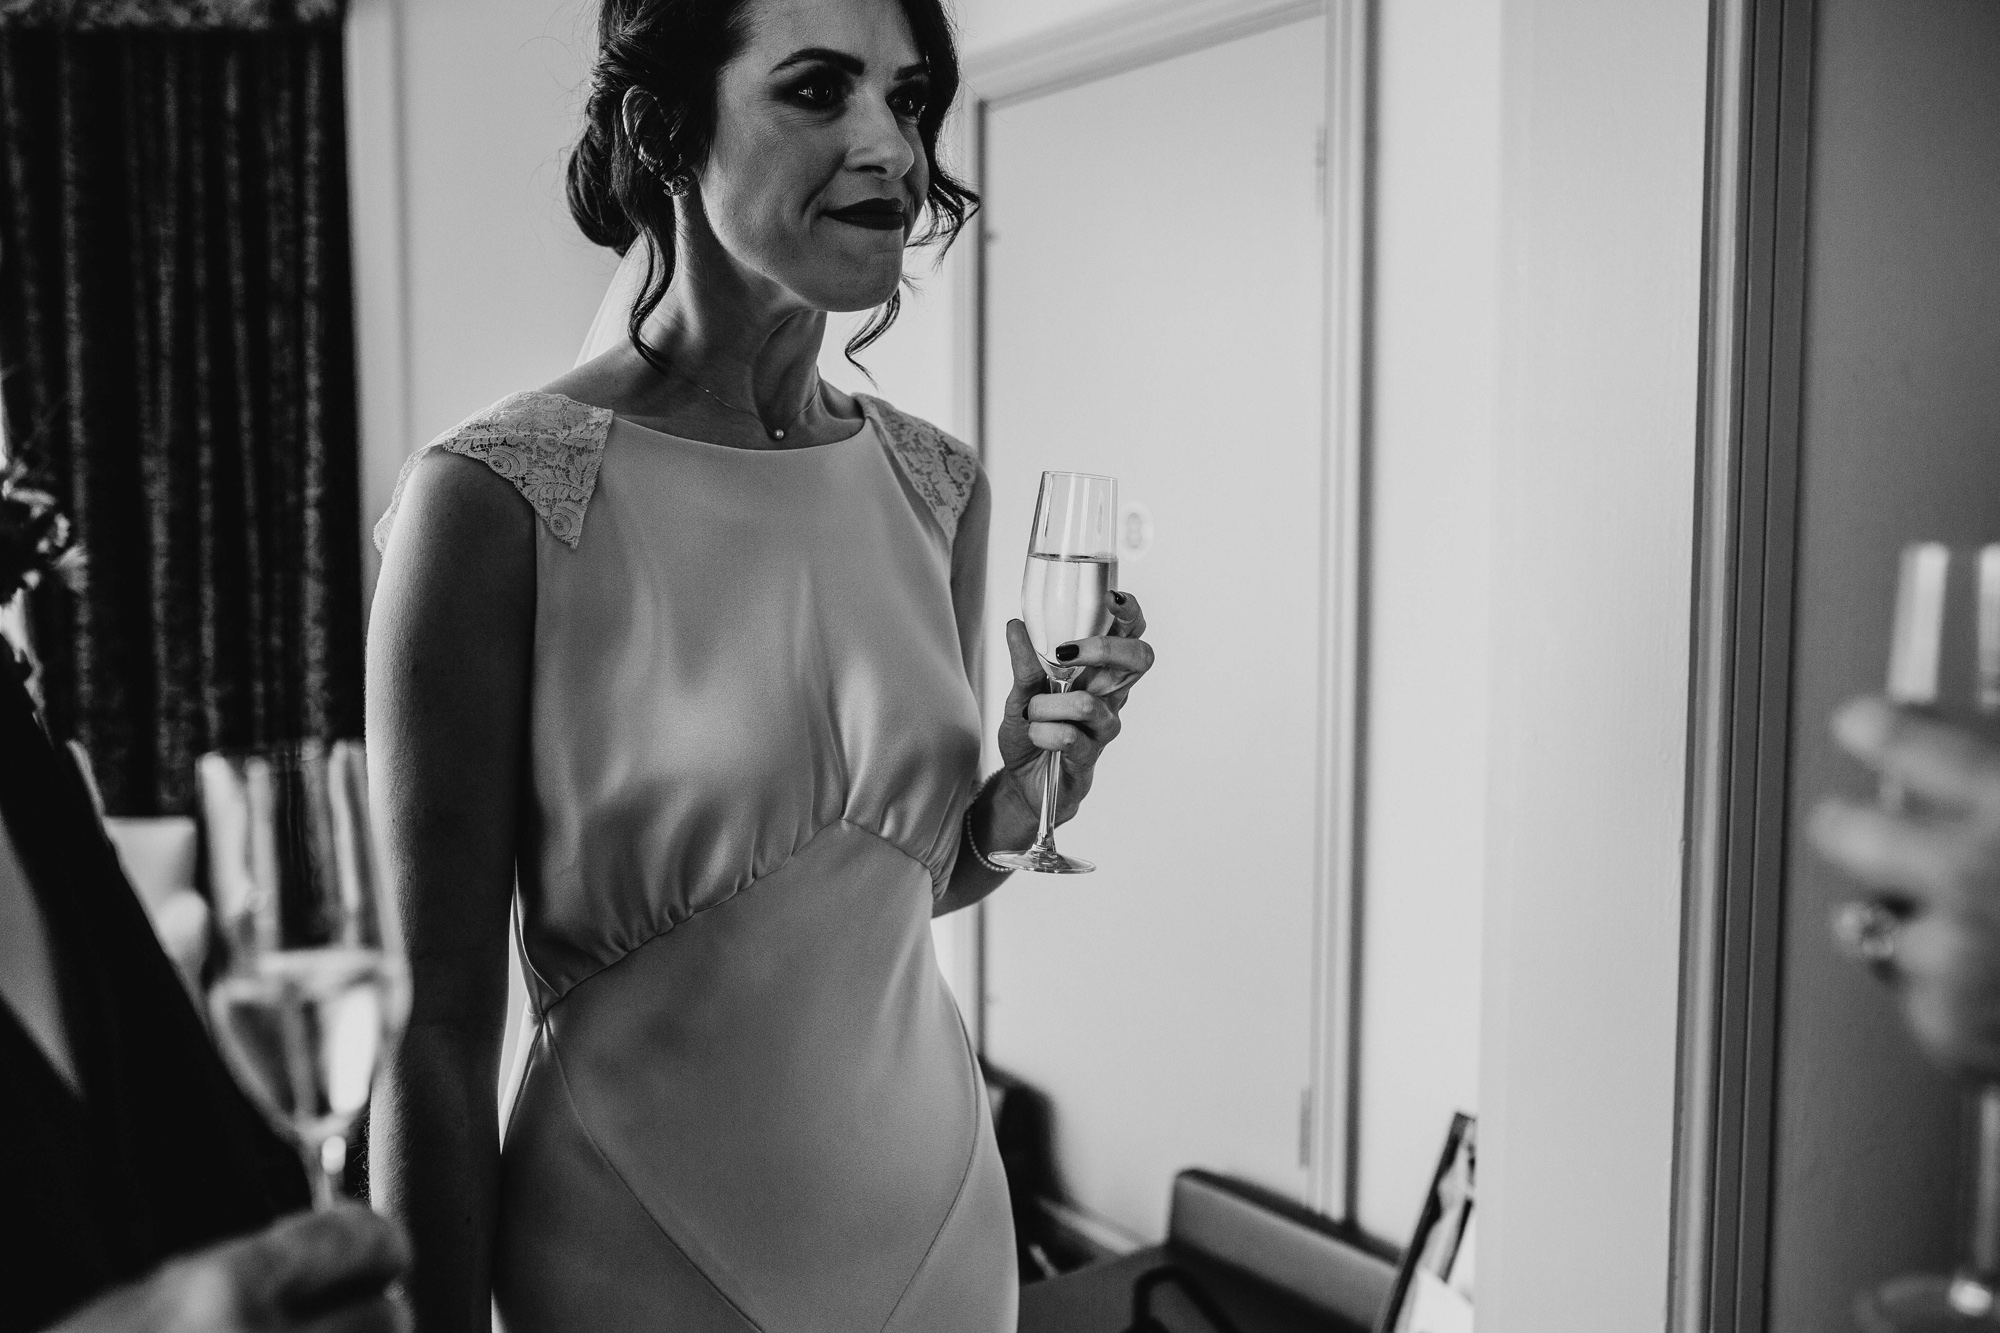 Sarah-Honeysuckle-Bias-Cut-Silk-Vintage-Inspired-Wedding-Gown-Sheffield-Wedding-Kate-Beaumont-7.jpg